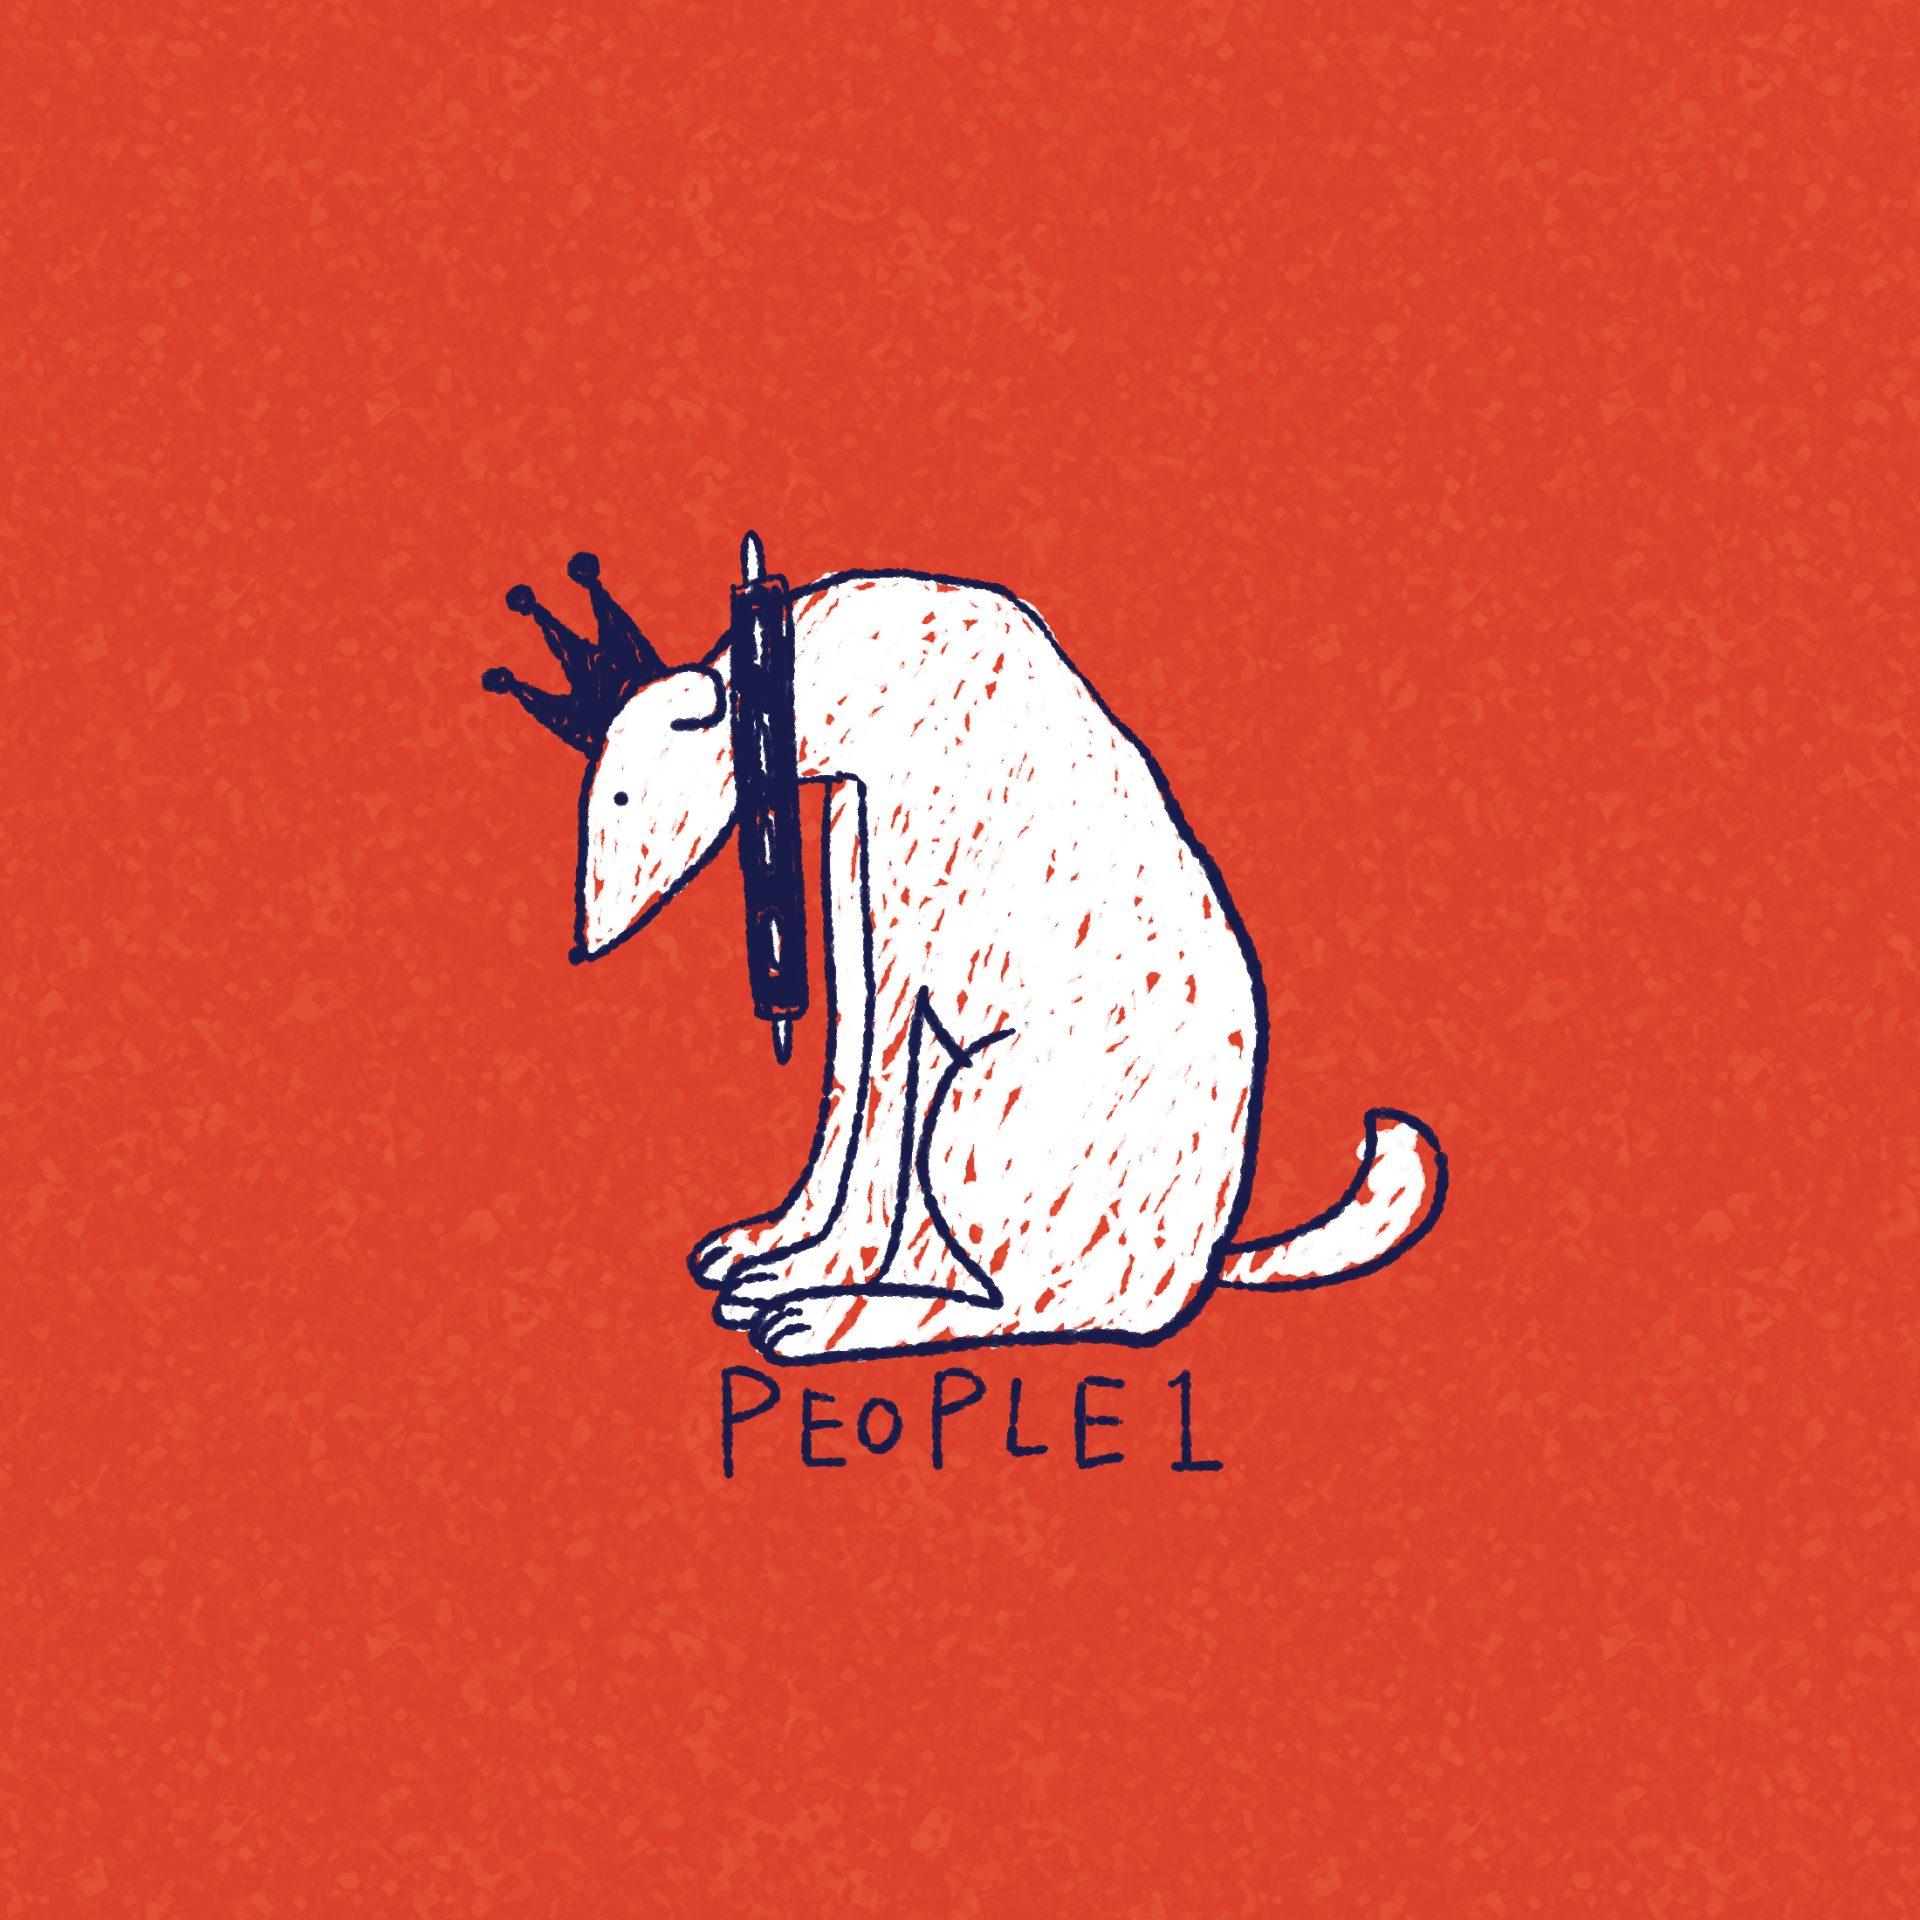 PEOPLE 1